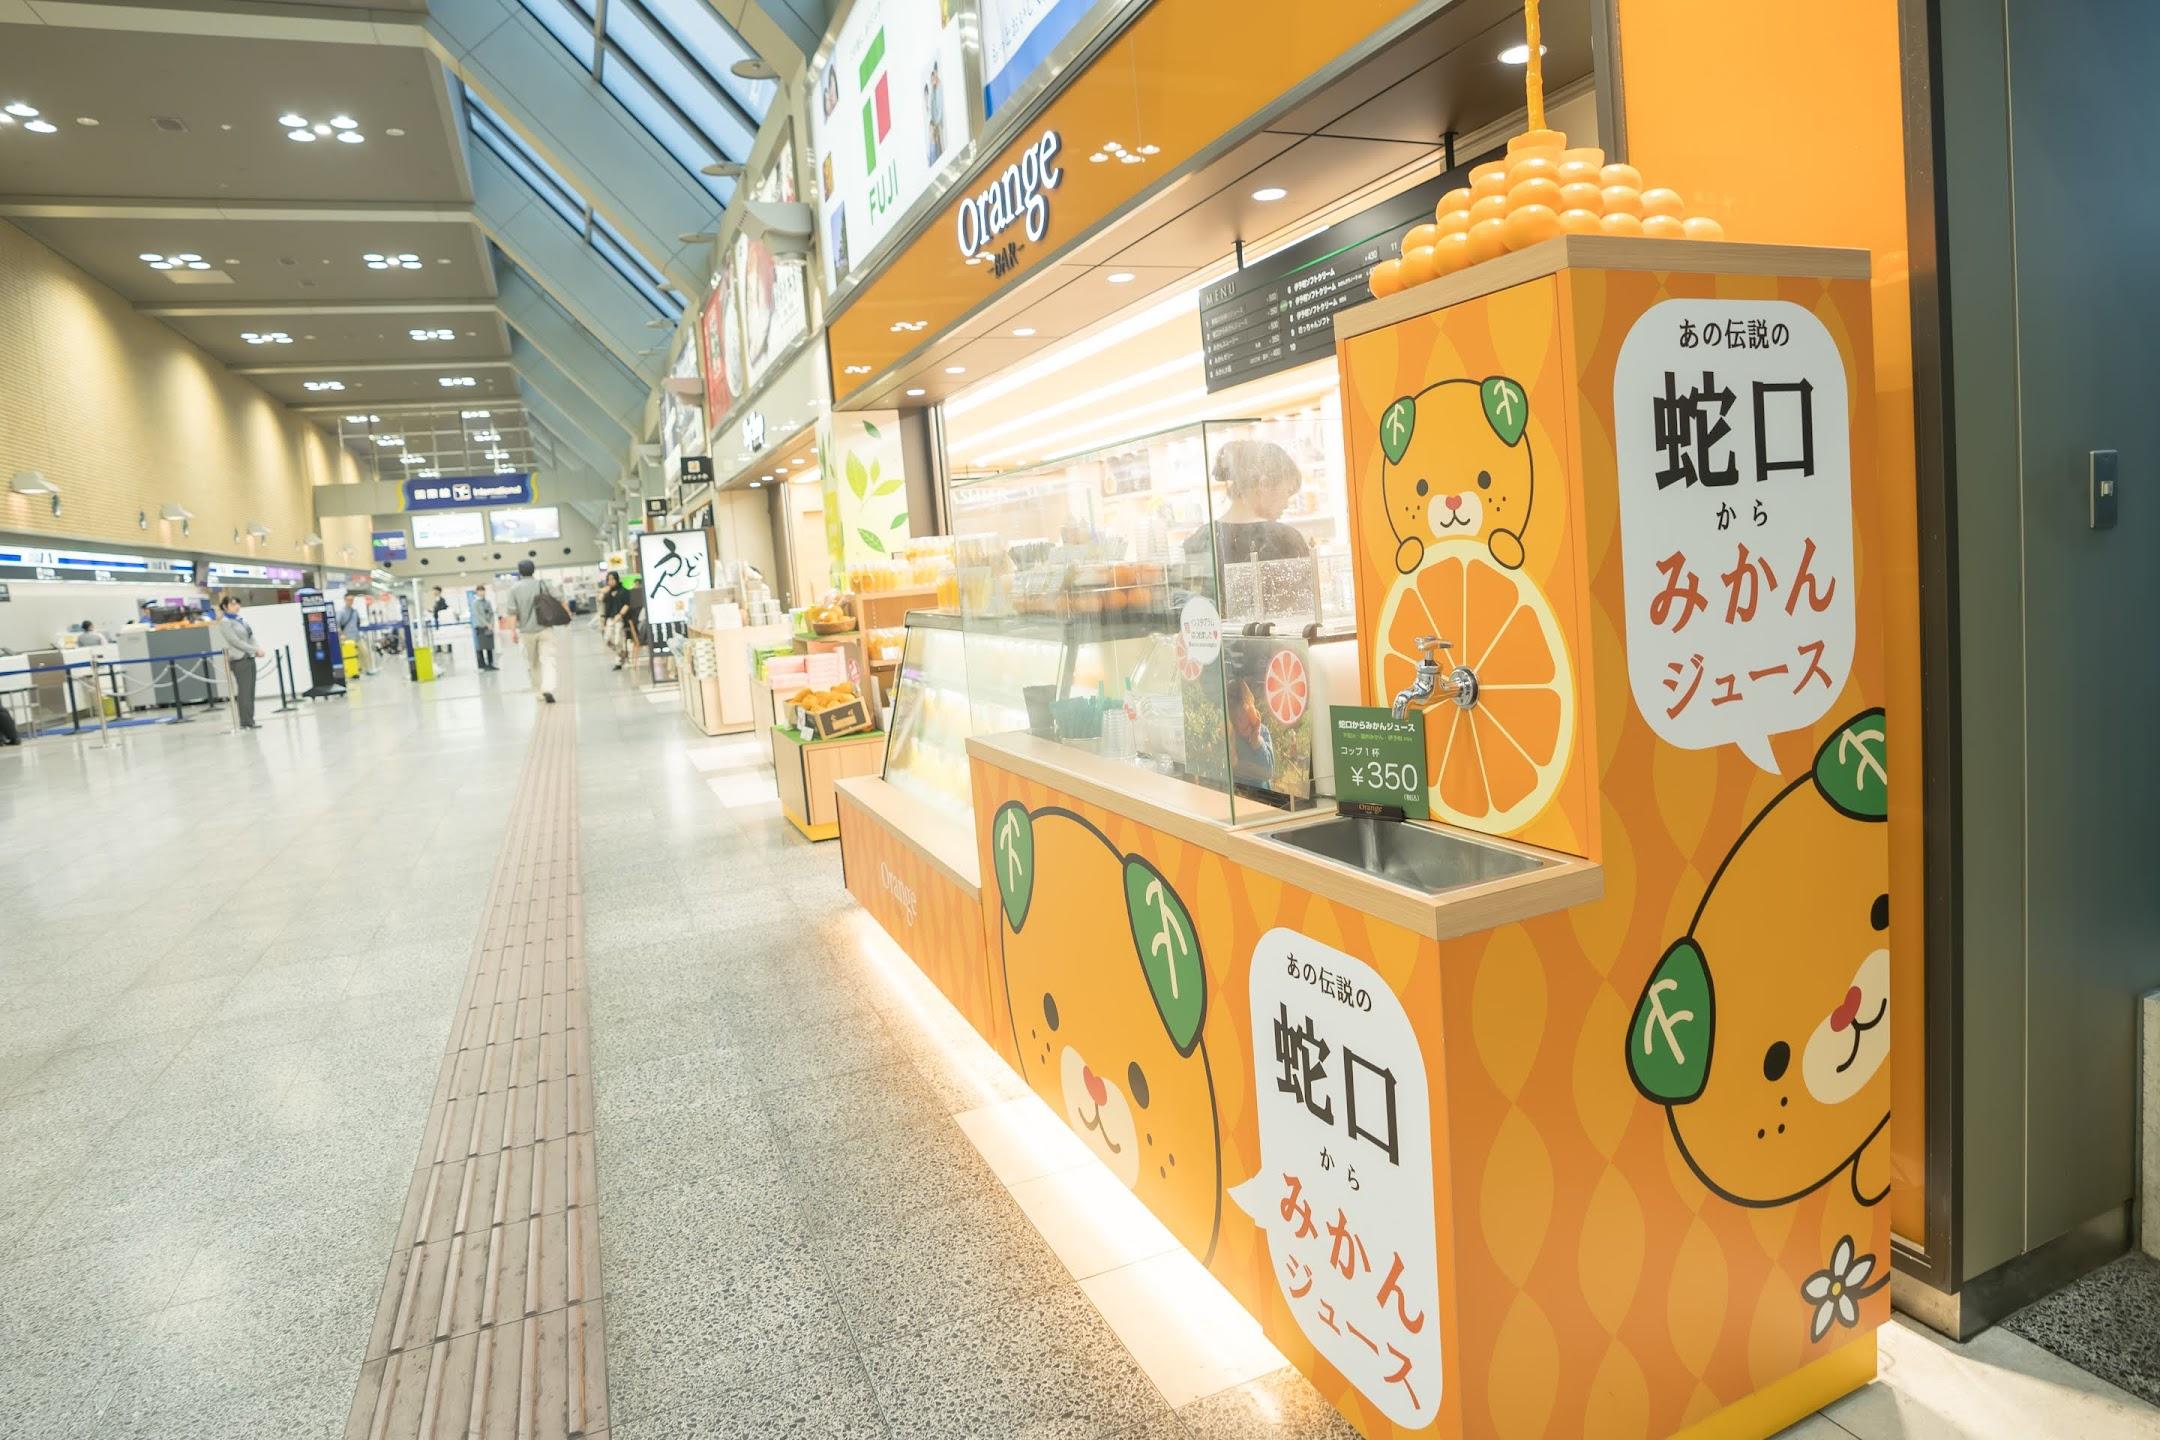 Matsuyama Airport Mikan Juice1